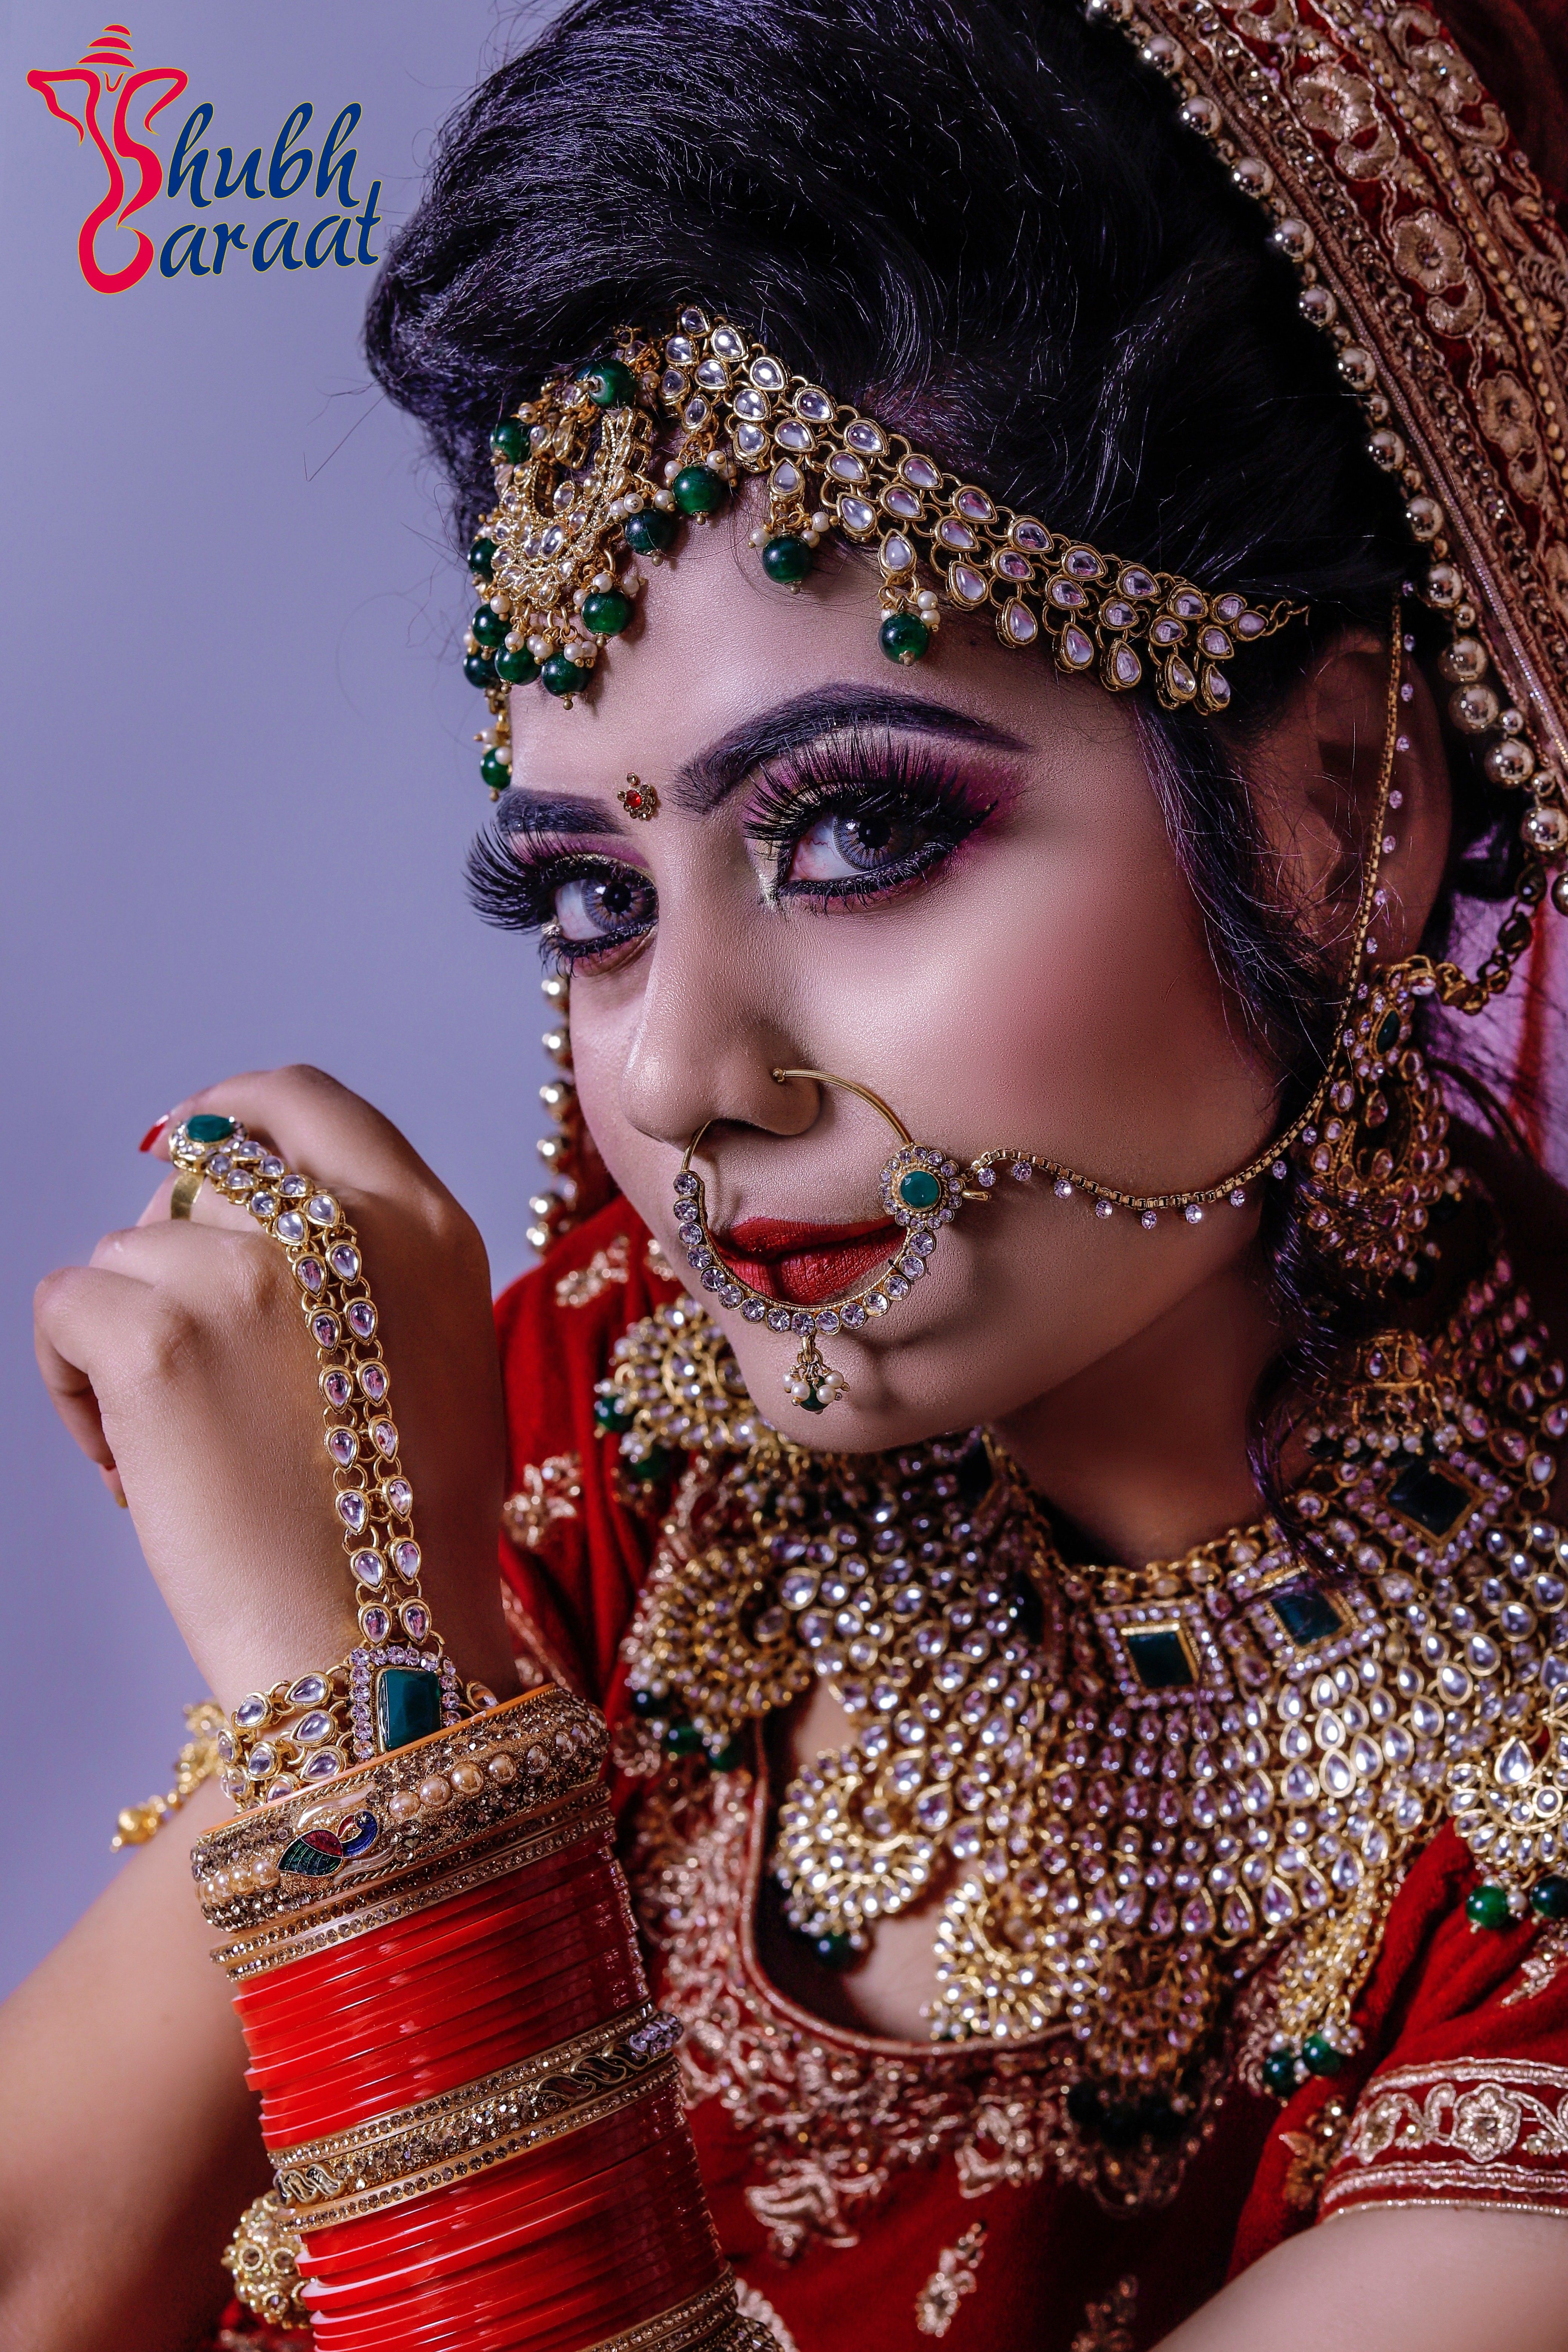 Best Makeup Artists Online In India On Shubhbaraat (With